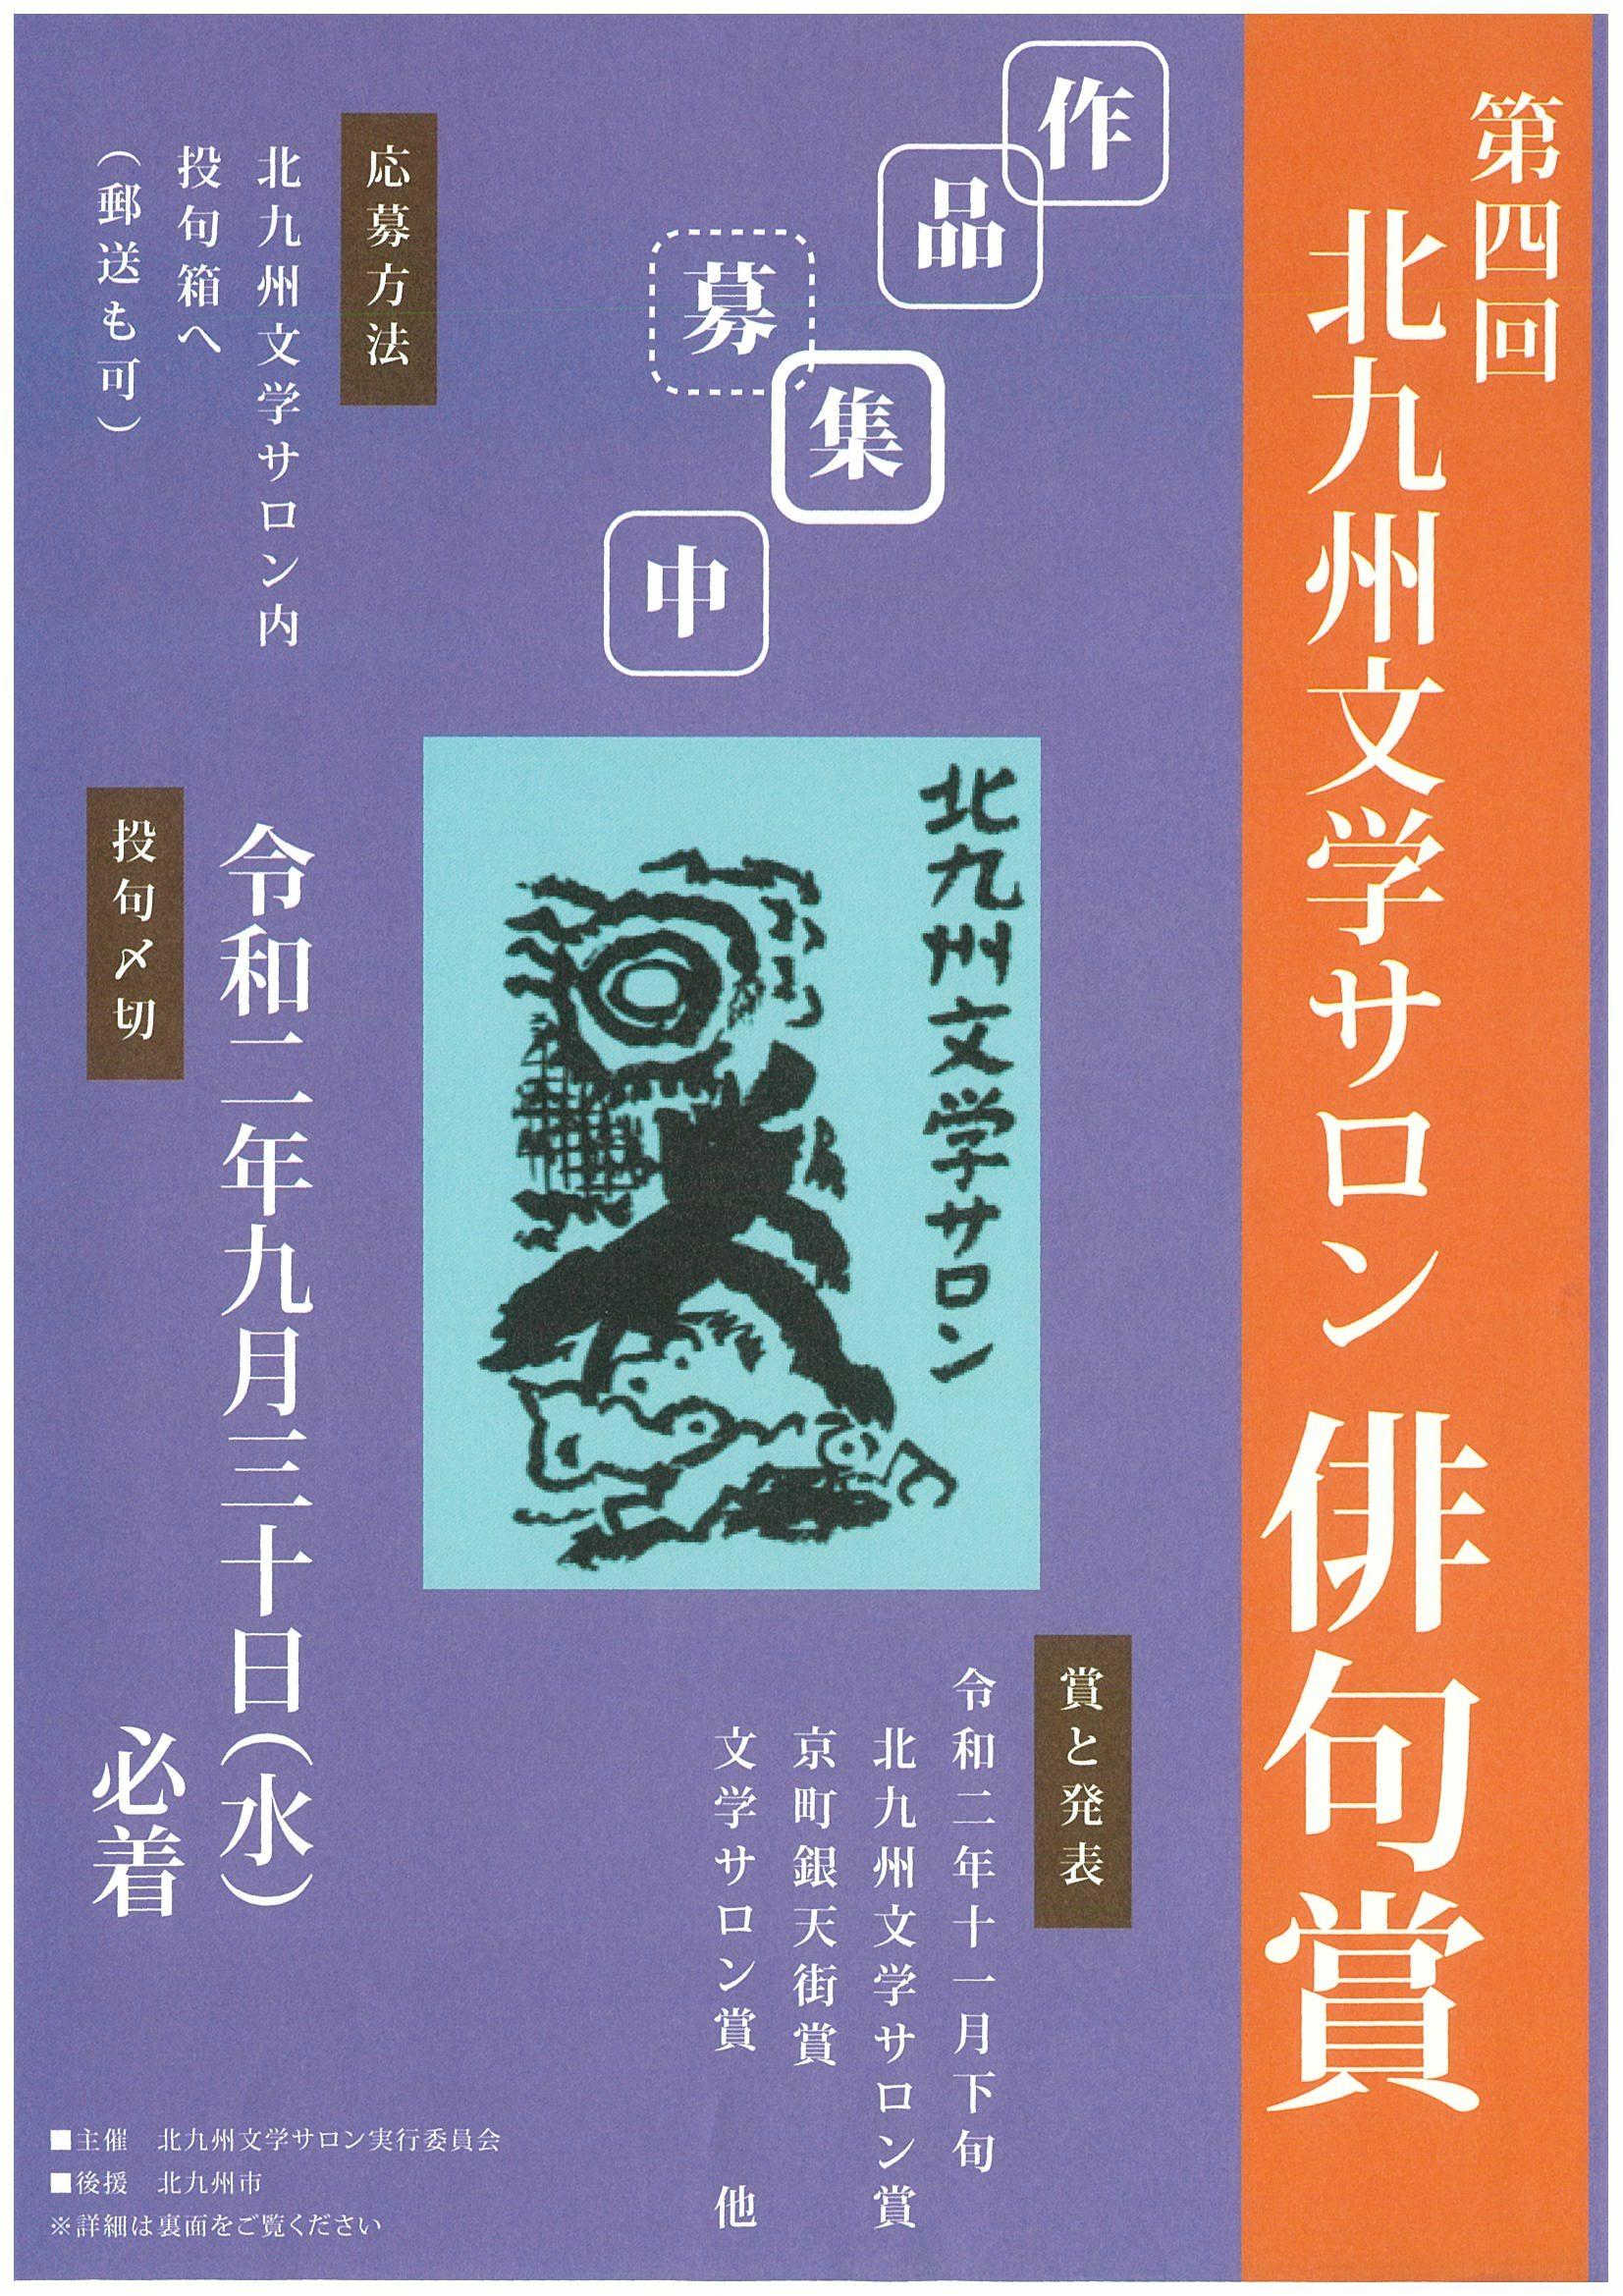 第4回北九州文学サロン俳句賞-1